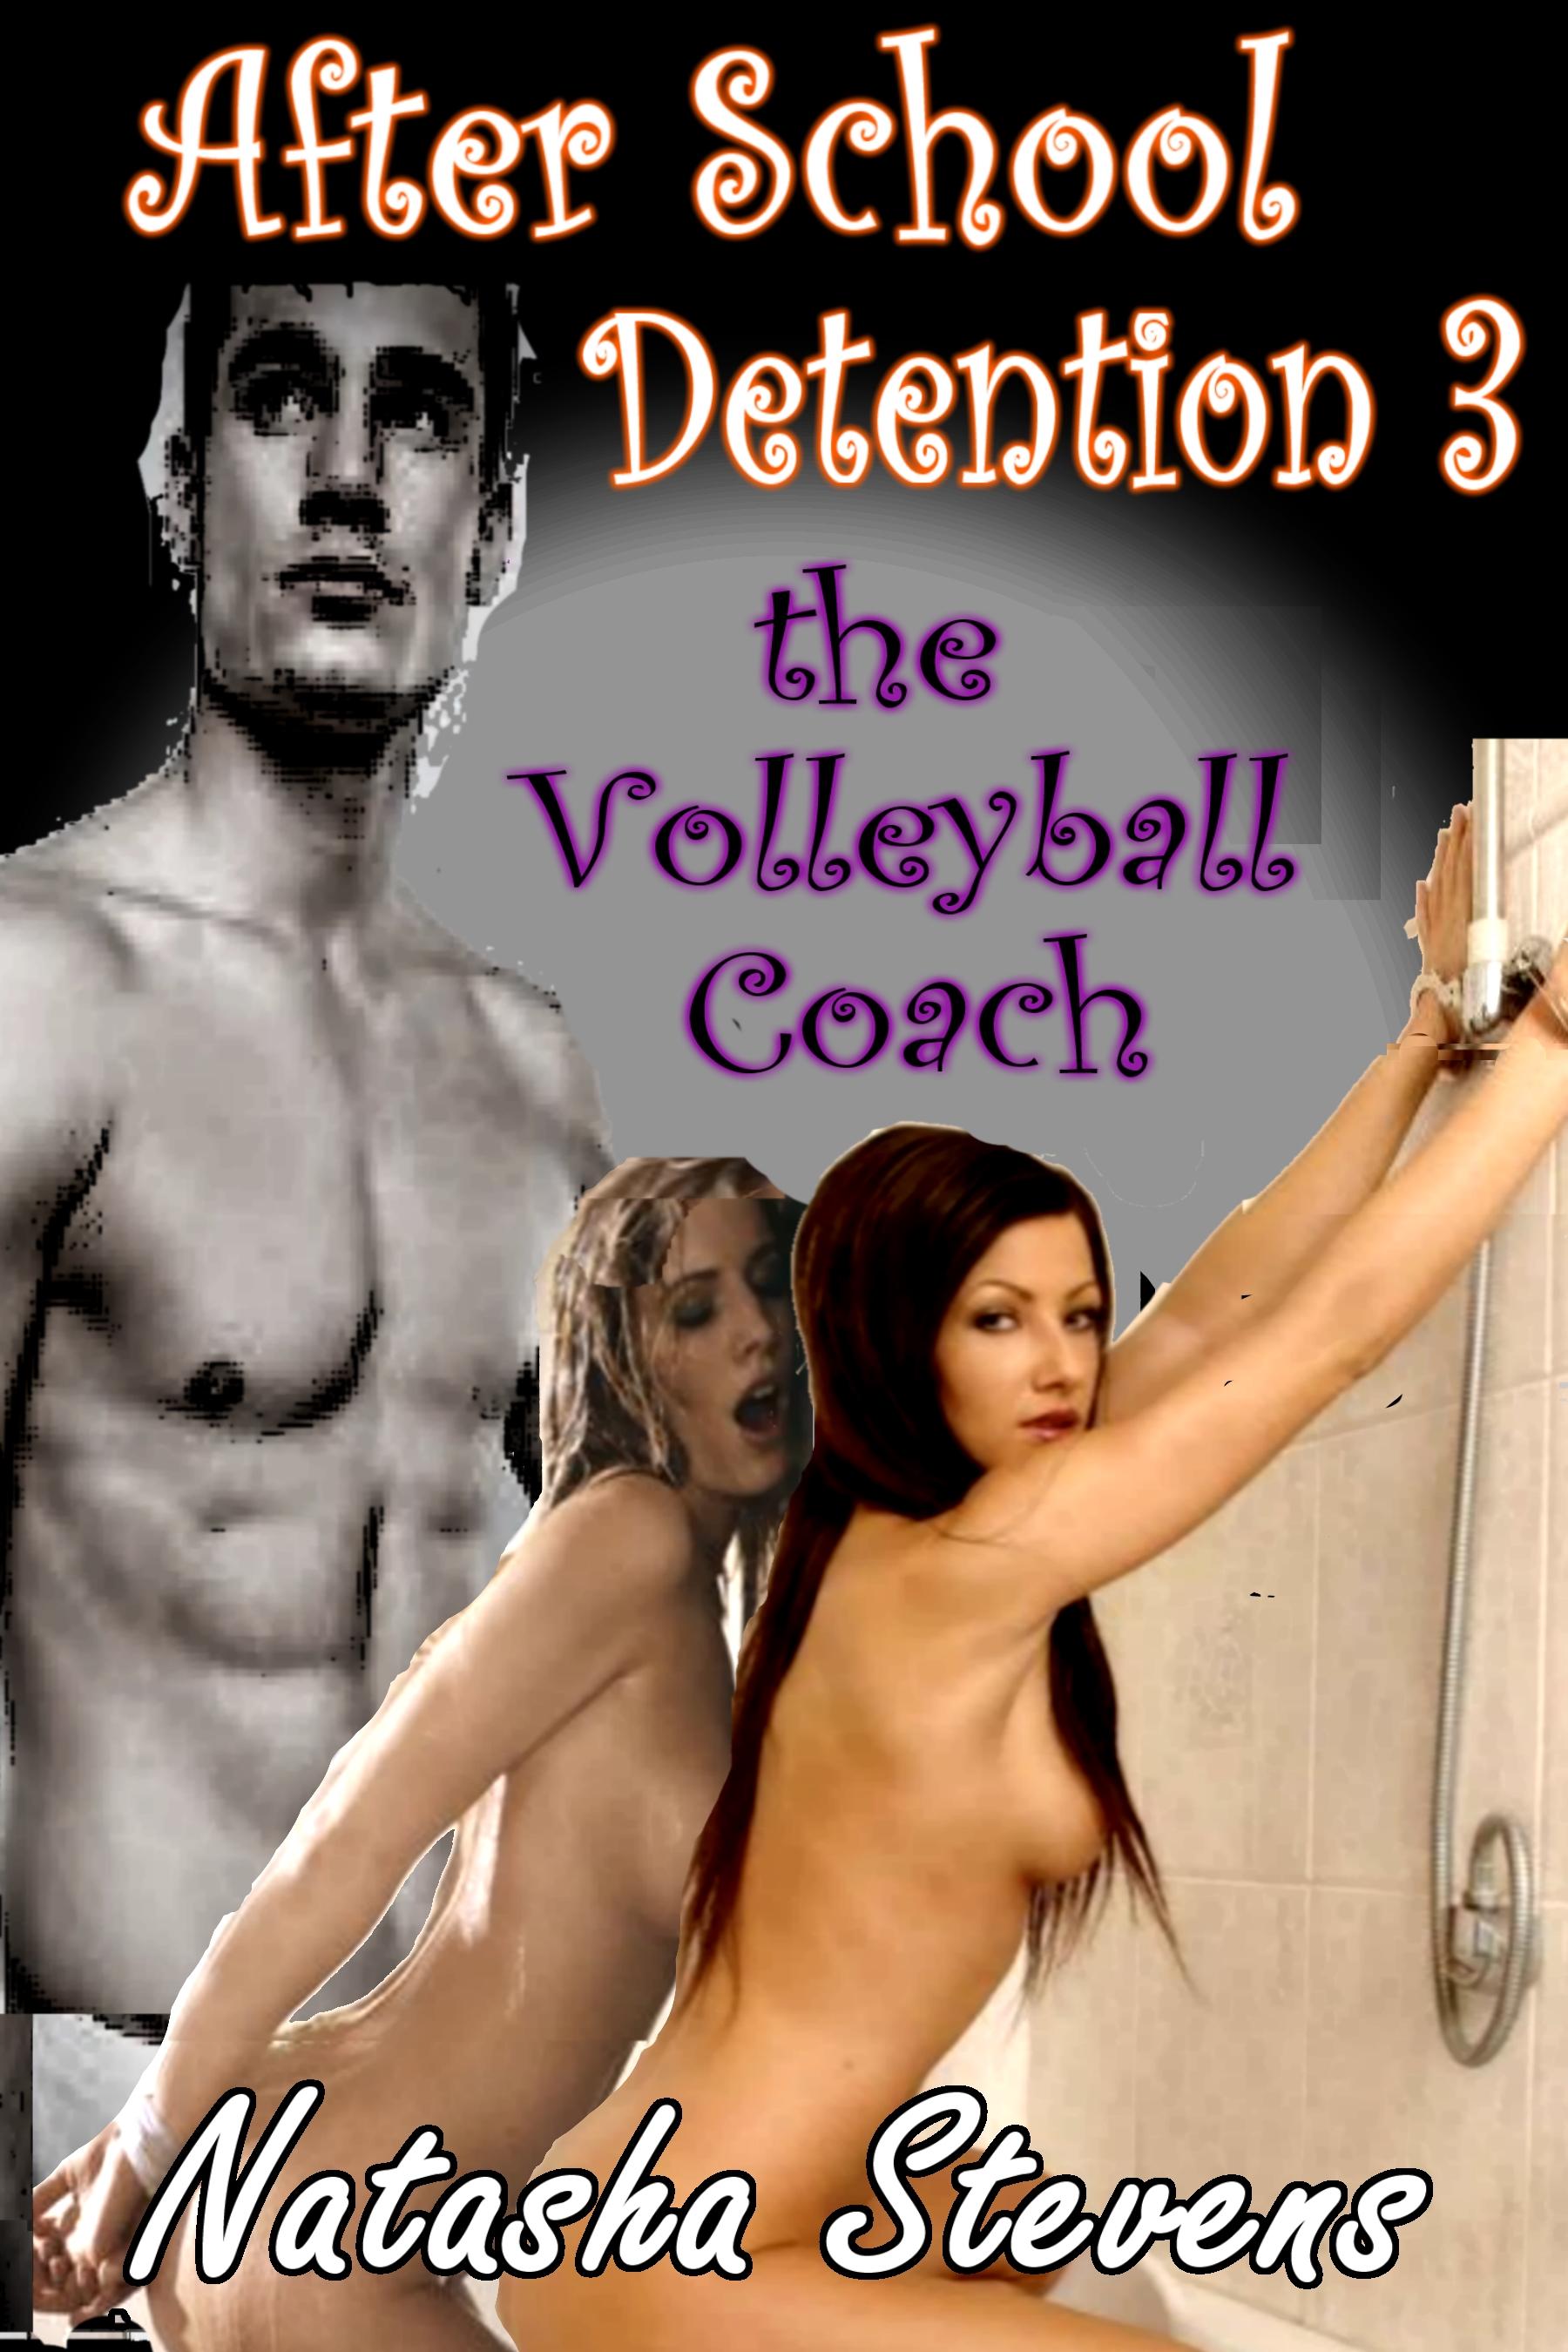 Slutty Volleyball Simple slutty schoolgirls: gabriella and valeria volume 1 | natasha